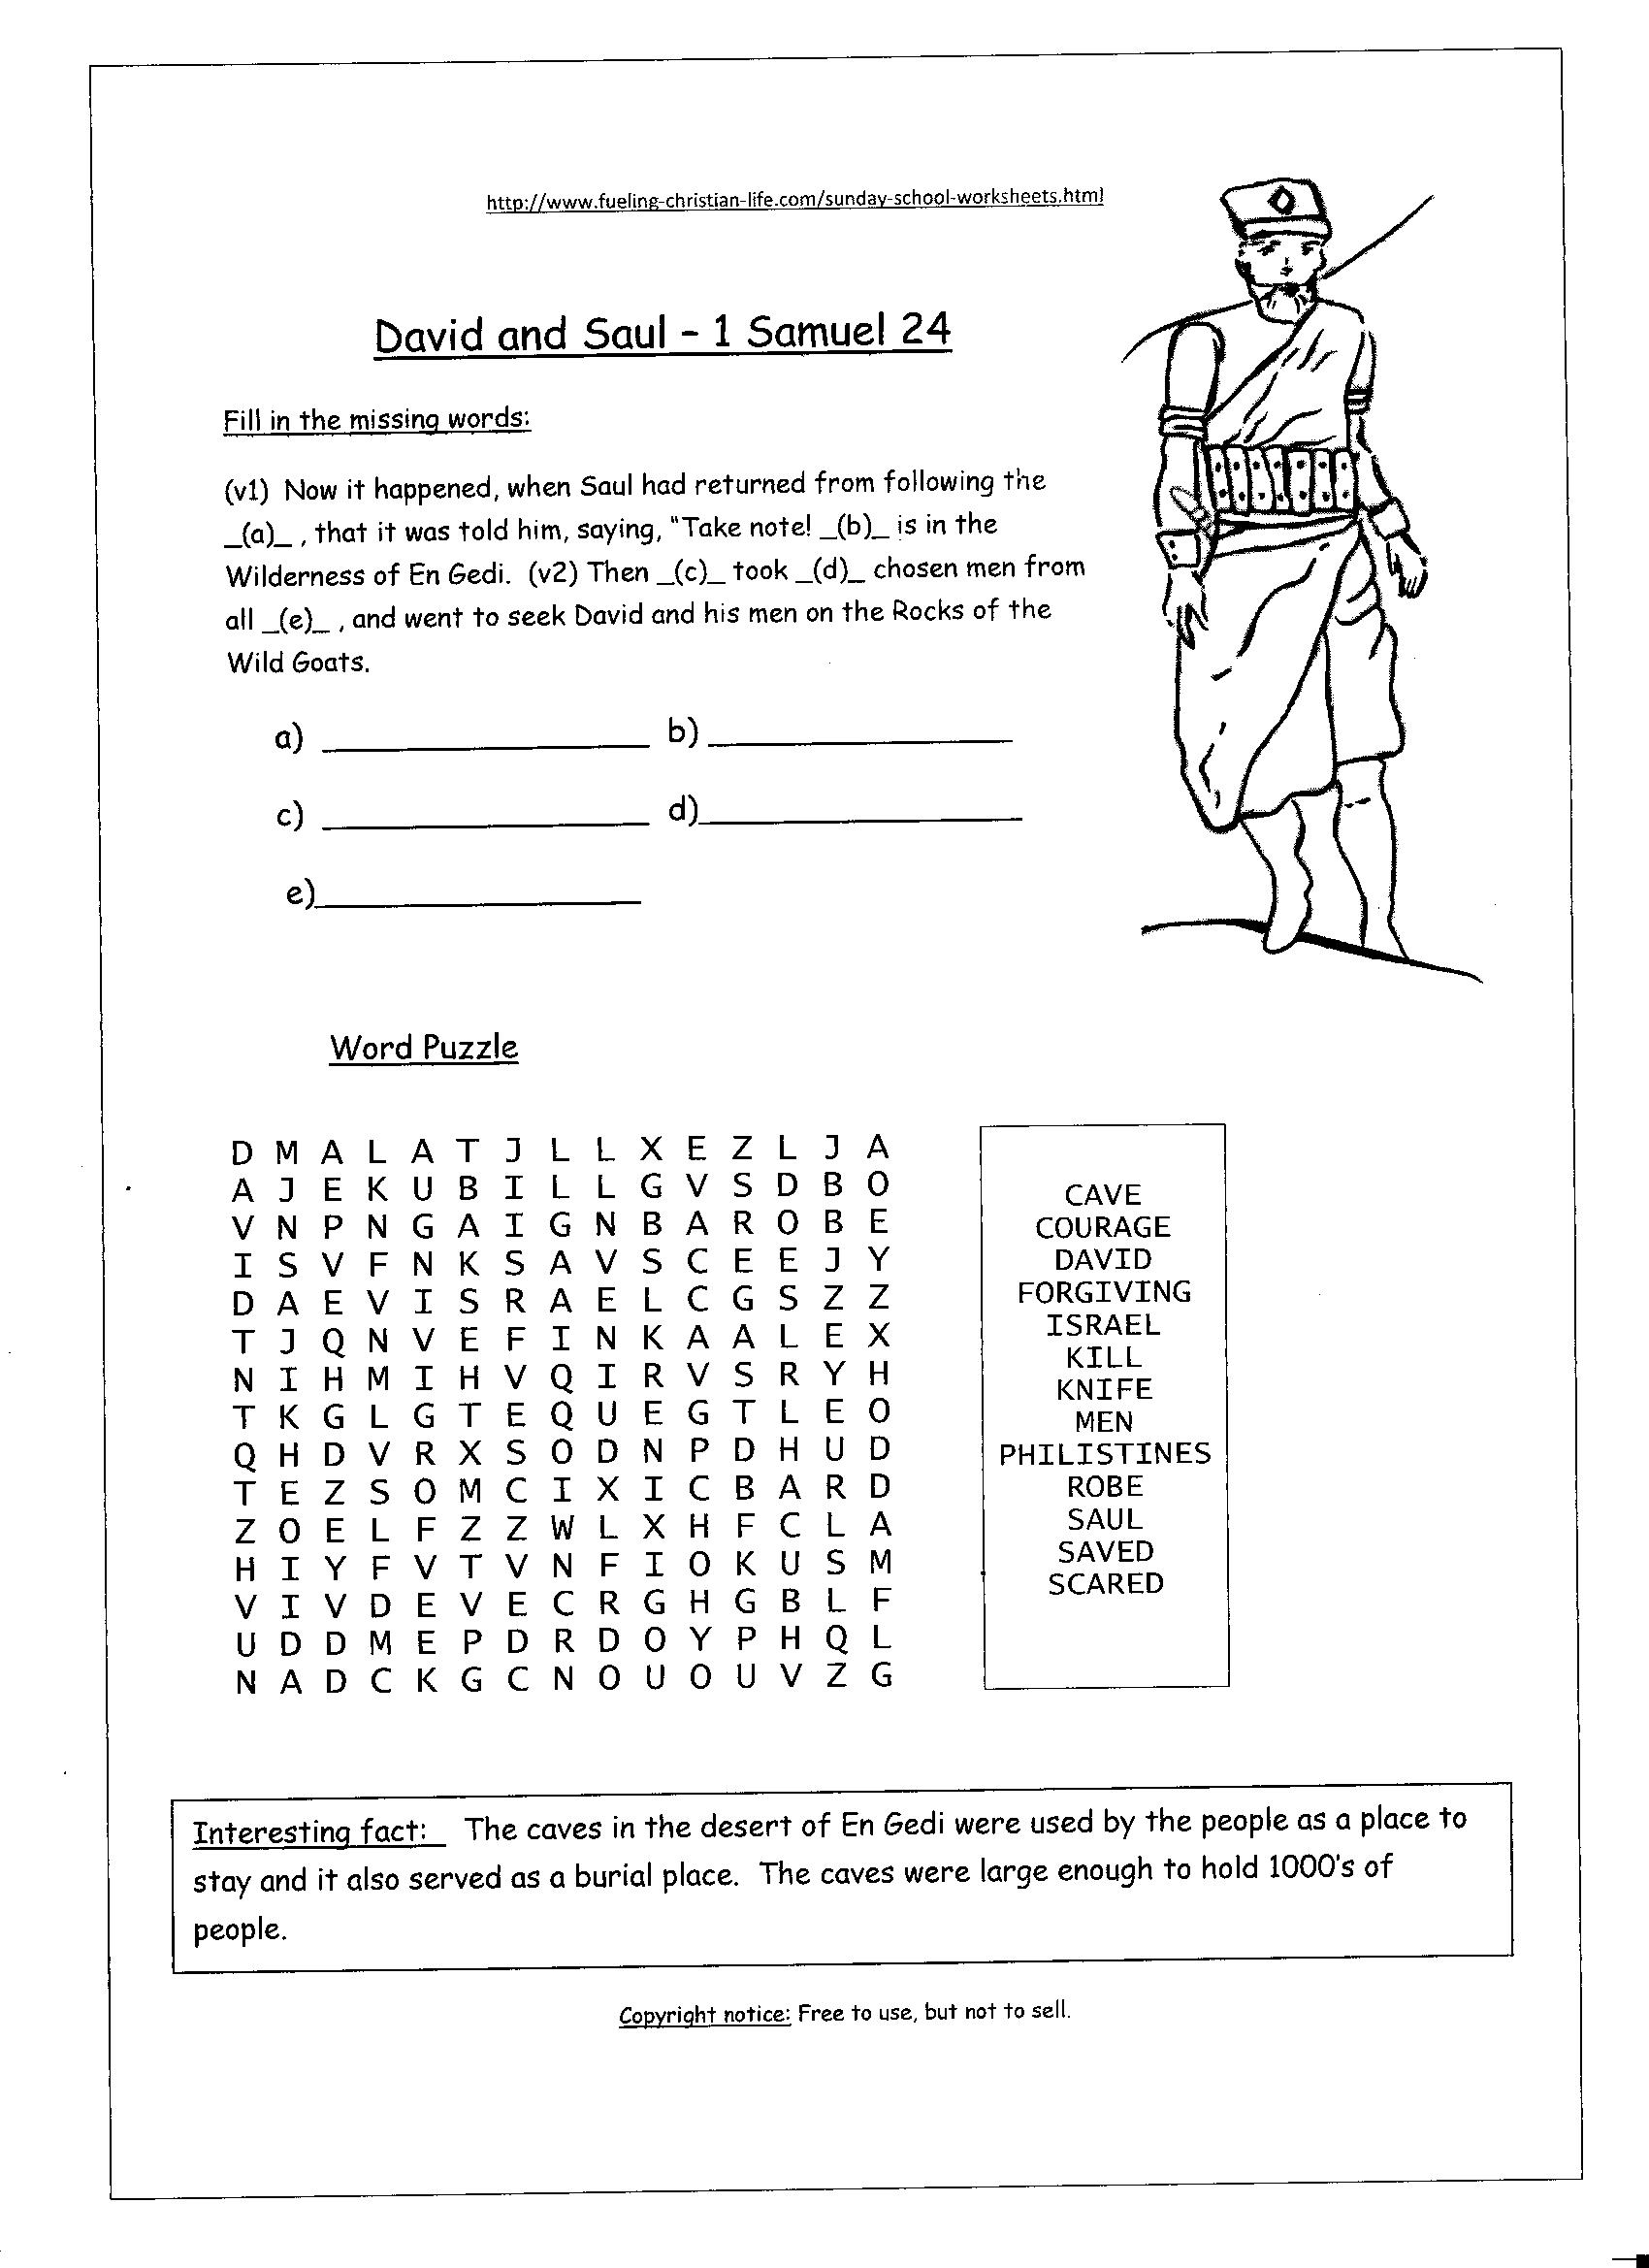 David And Saul Sunday School Worksheet